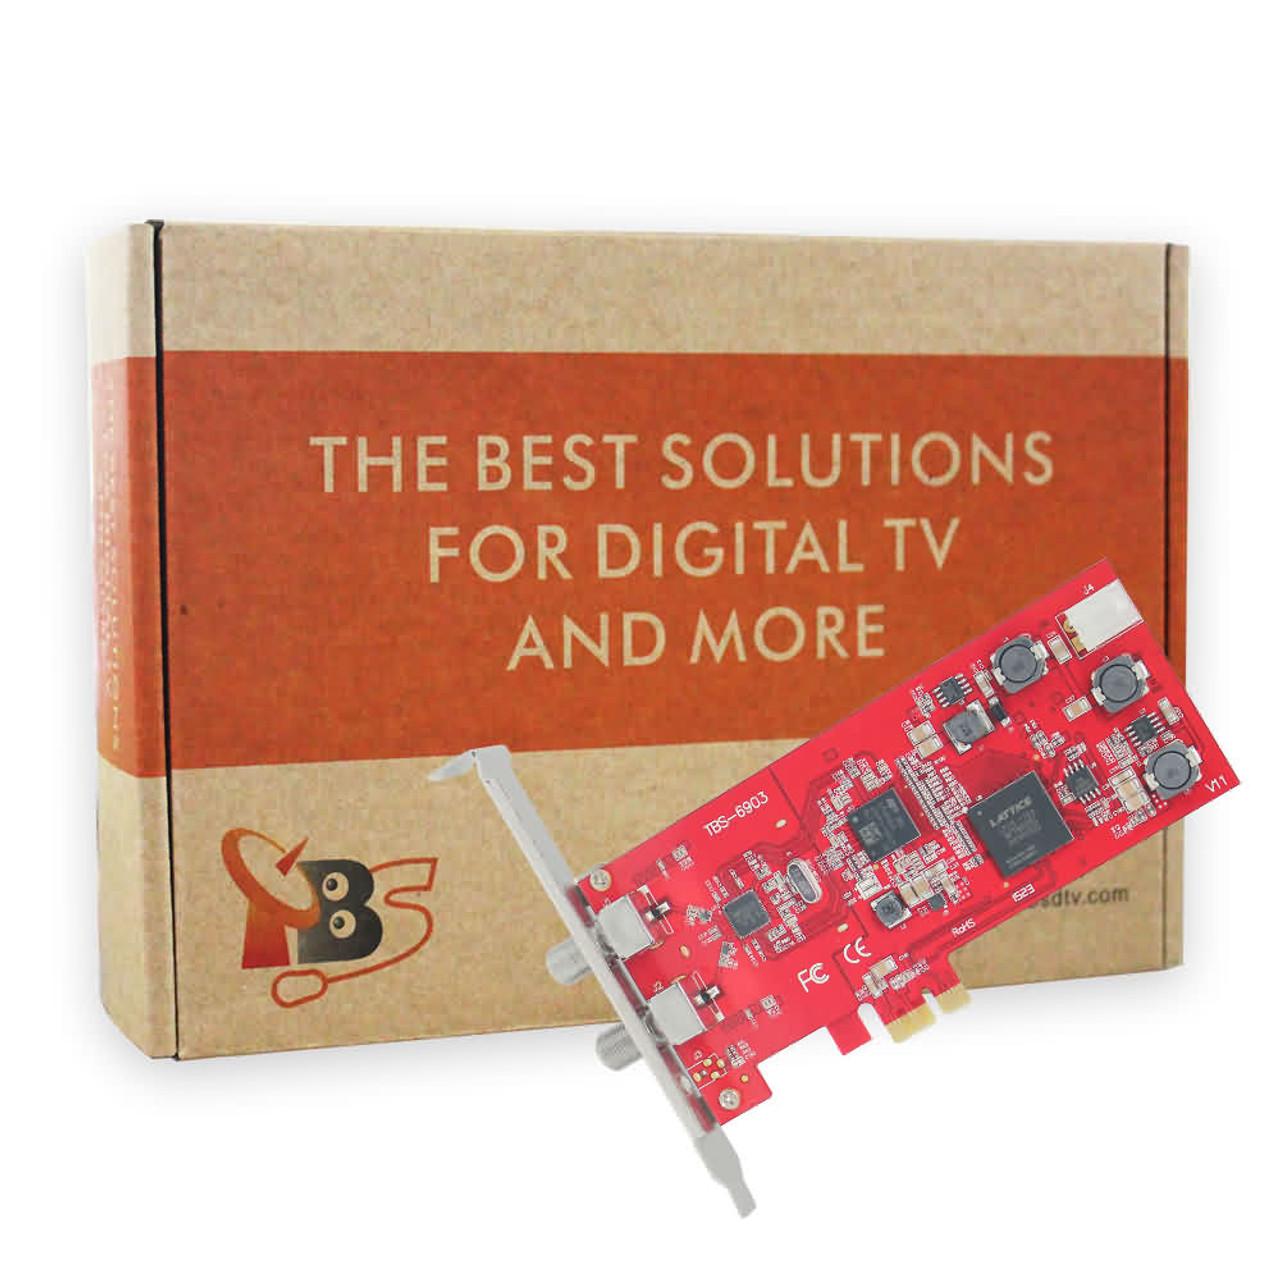 TBS6903 Professional DVB-S2 Dual Tuner PCIe Card